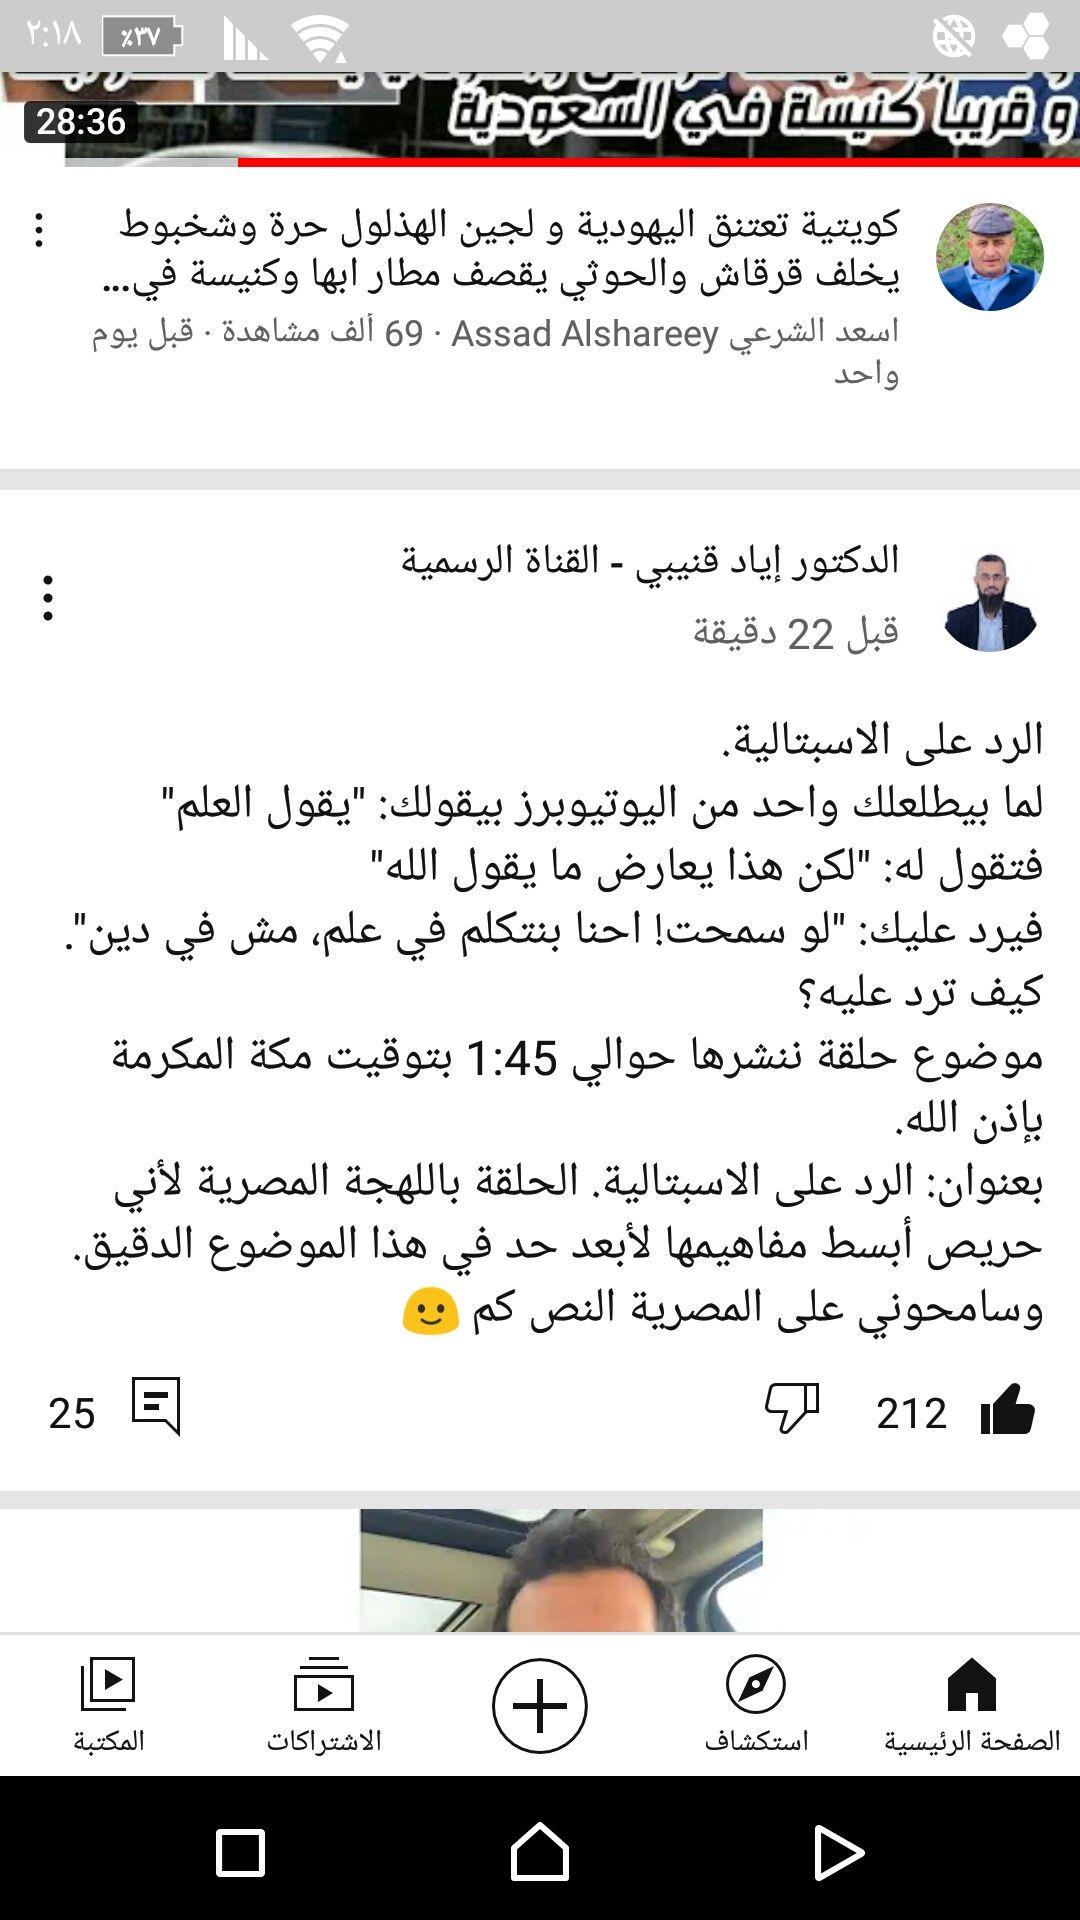 Pin By ضحى عبد القادر On الدكتور إياد القنيبي In 2021 Shopping